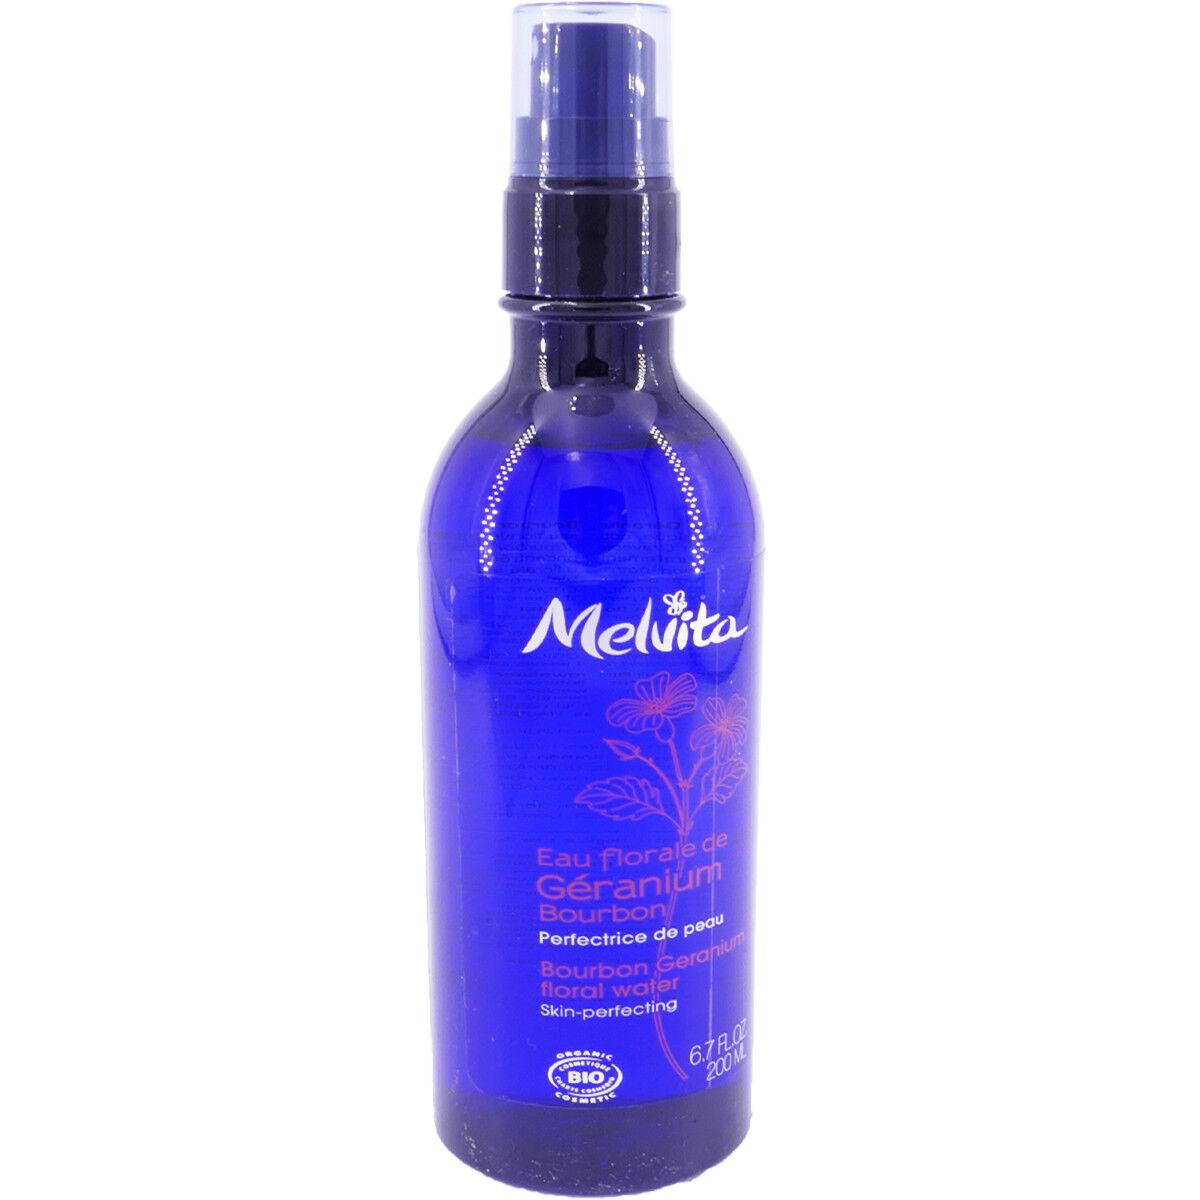 Melvita eau florale de geranuim bio 200 ml